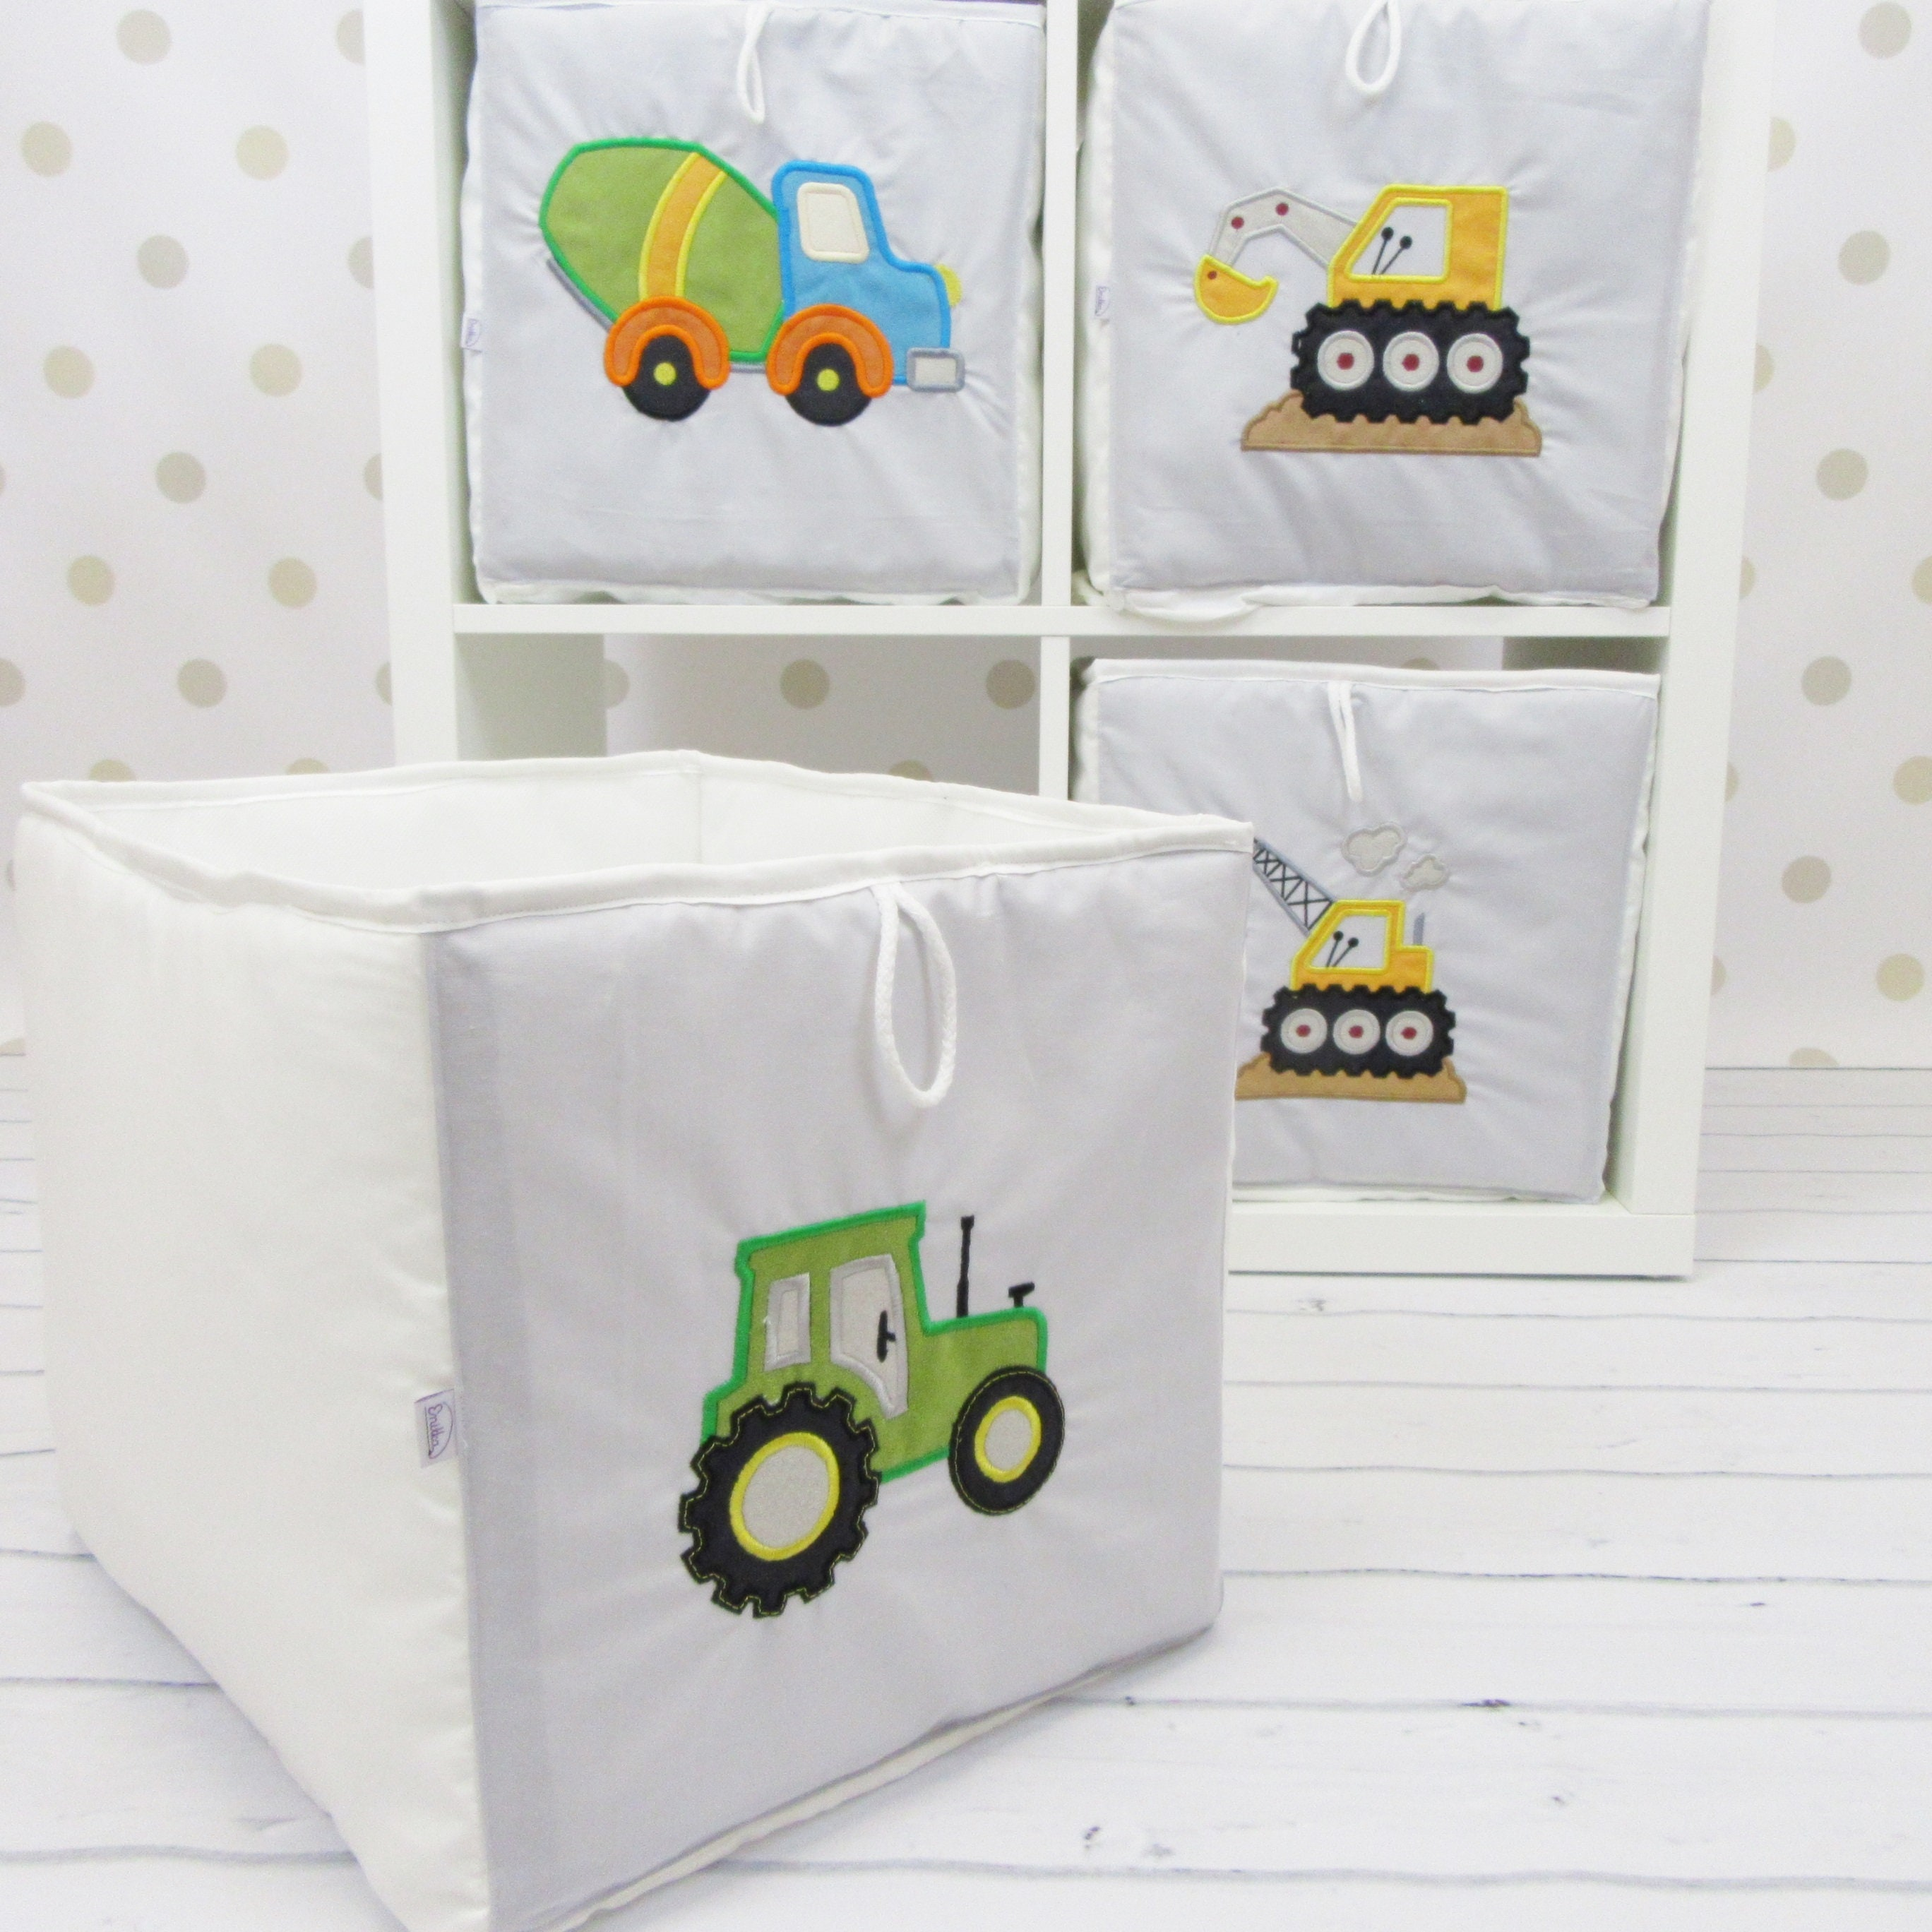 der beh lter aus traktor spielzeug ikea b cherregal kallax etsy. Black Bedroom Furniture Sets. Home Design Ideas